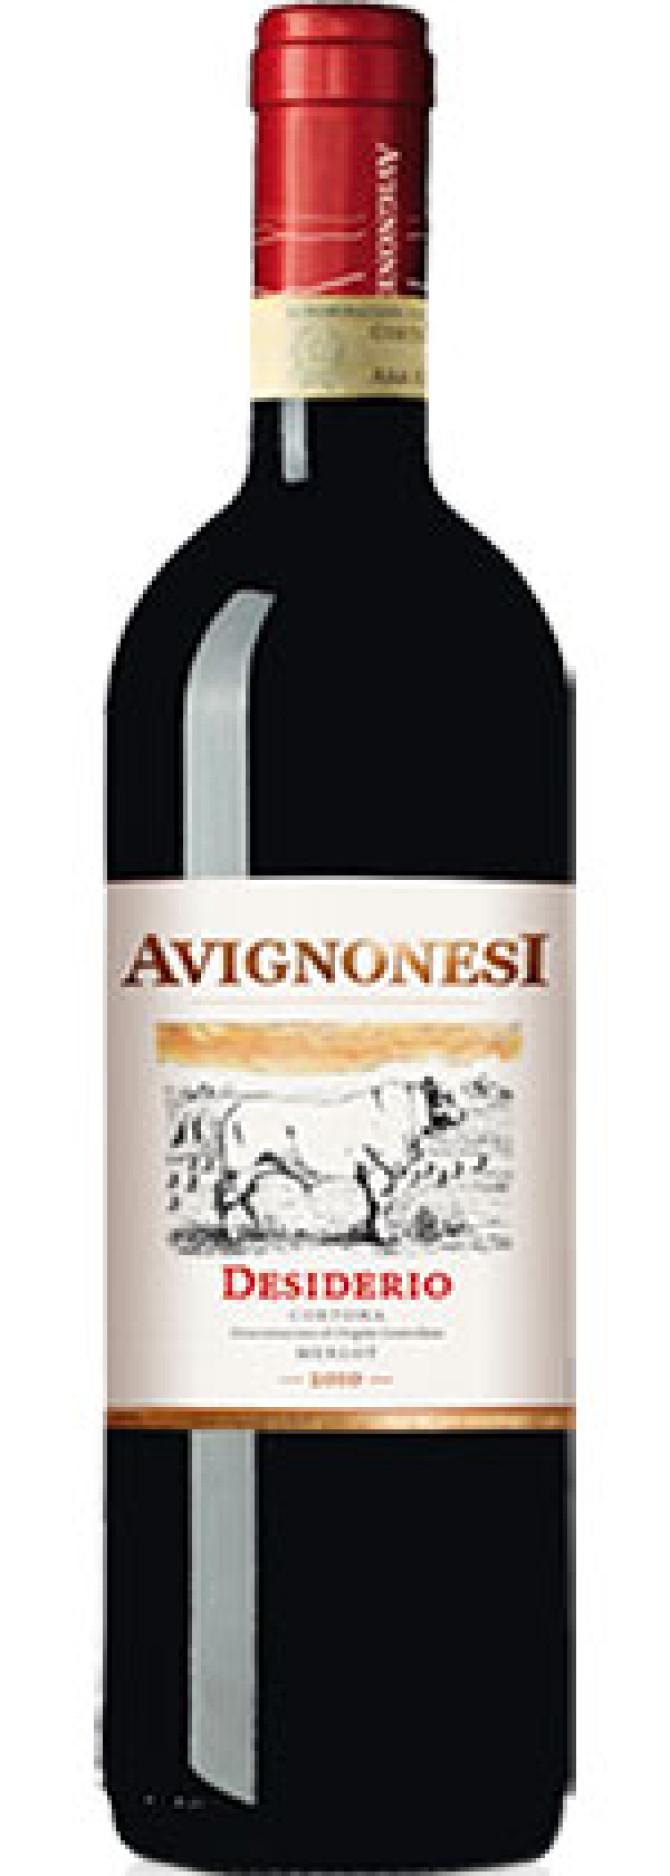 Avignonesi-Desiderio